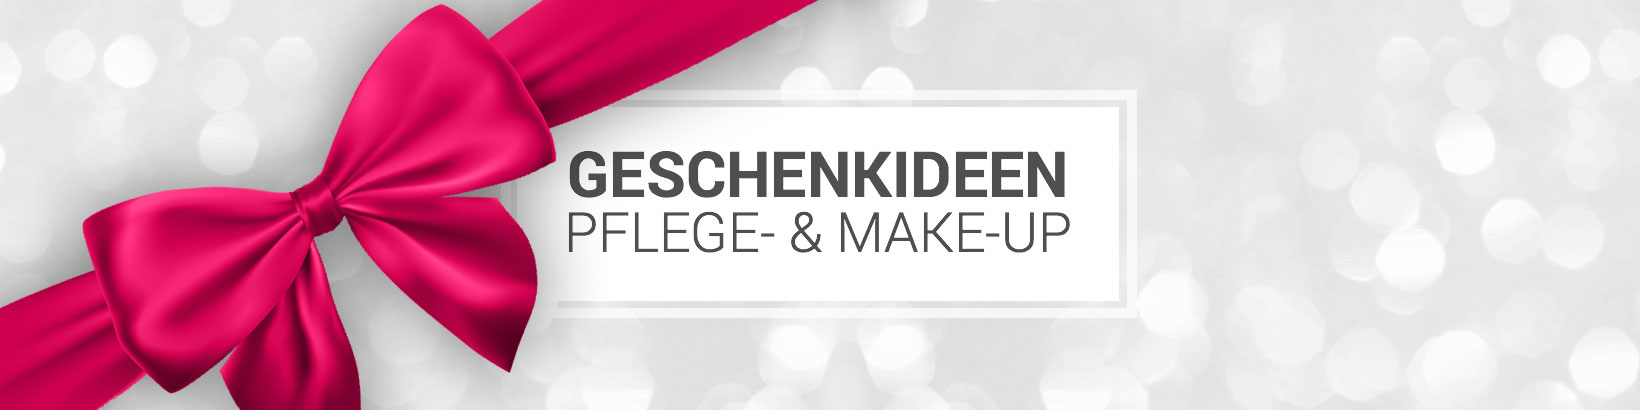 geschenkewelt-geschenkideen-pflege-make-up-damen-header